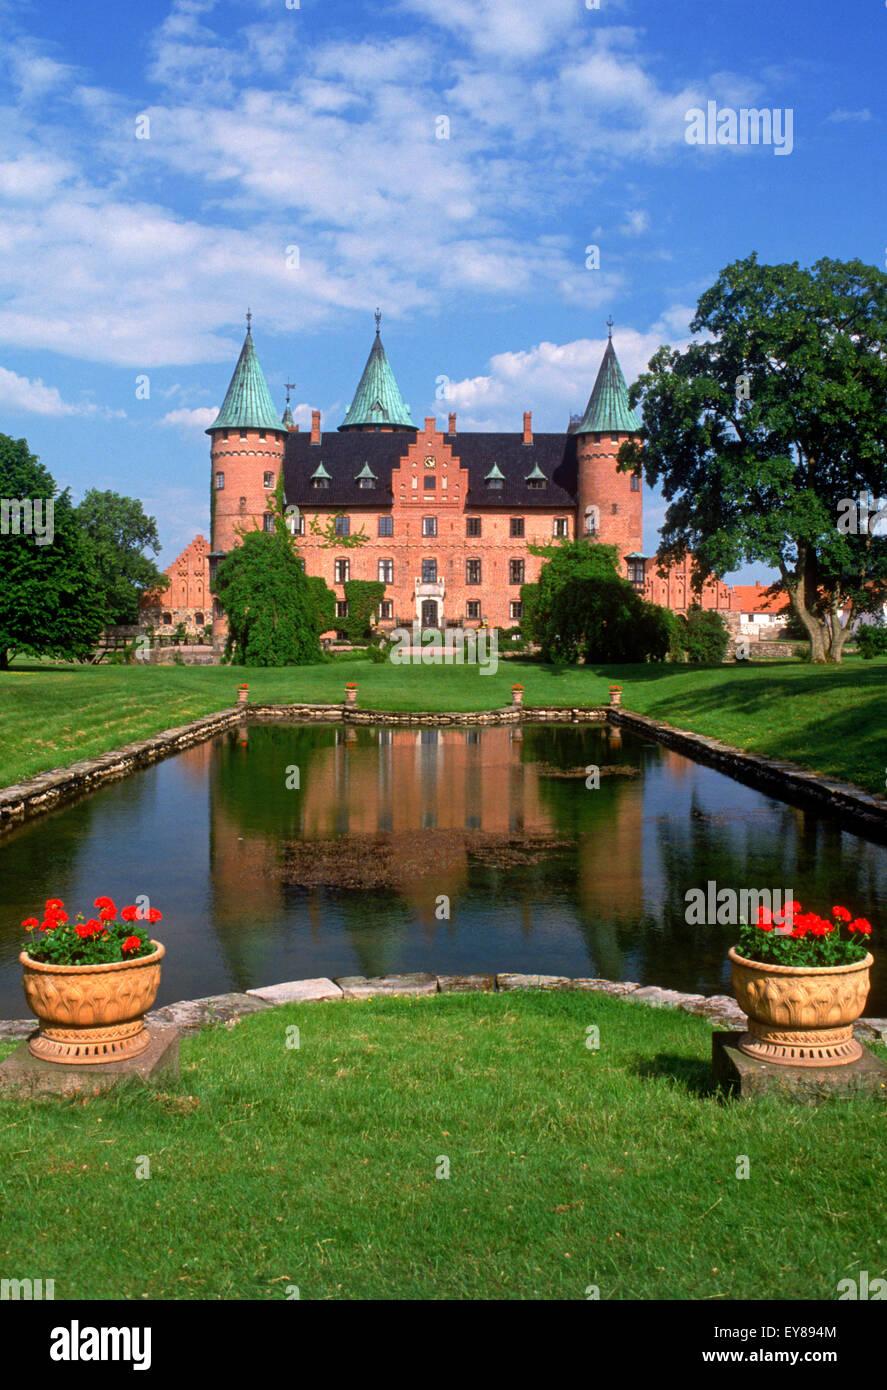 Private estate Renaissance castle of Trolleholm (Trolleholms slott) in province of Skane in southern Sweden - Stock Image